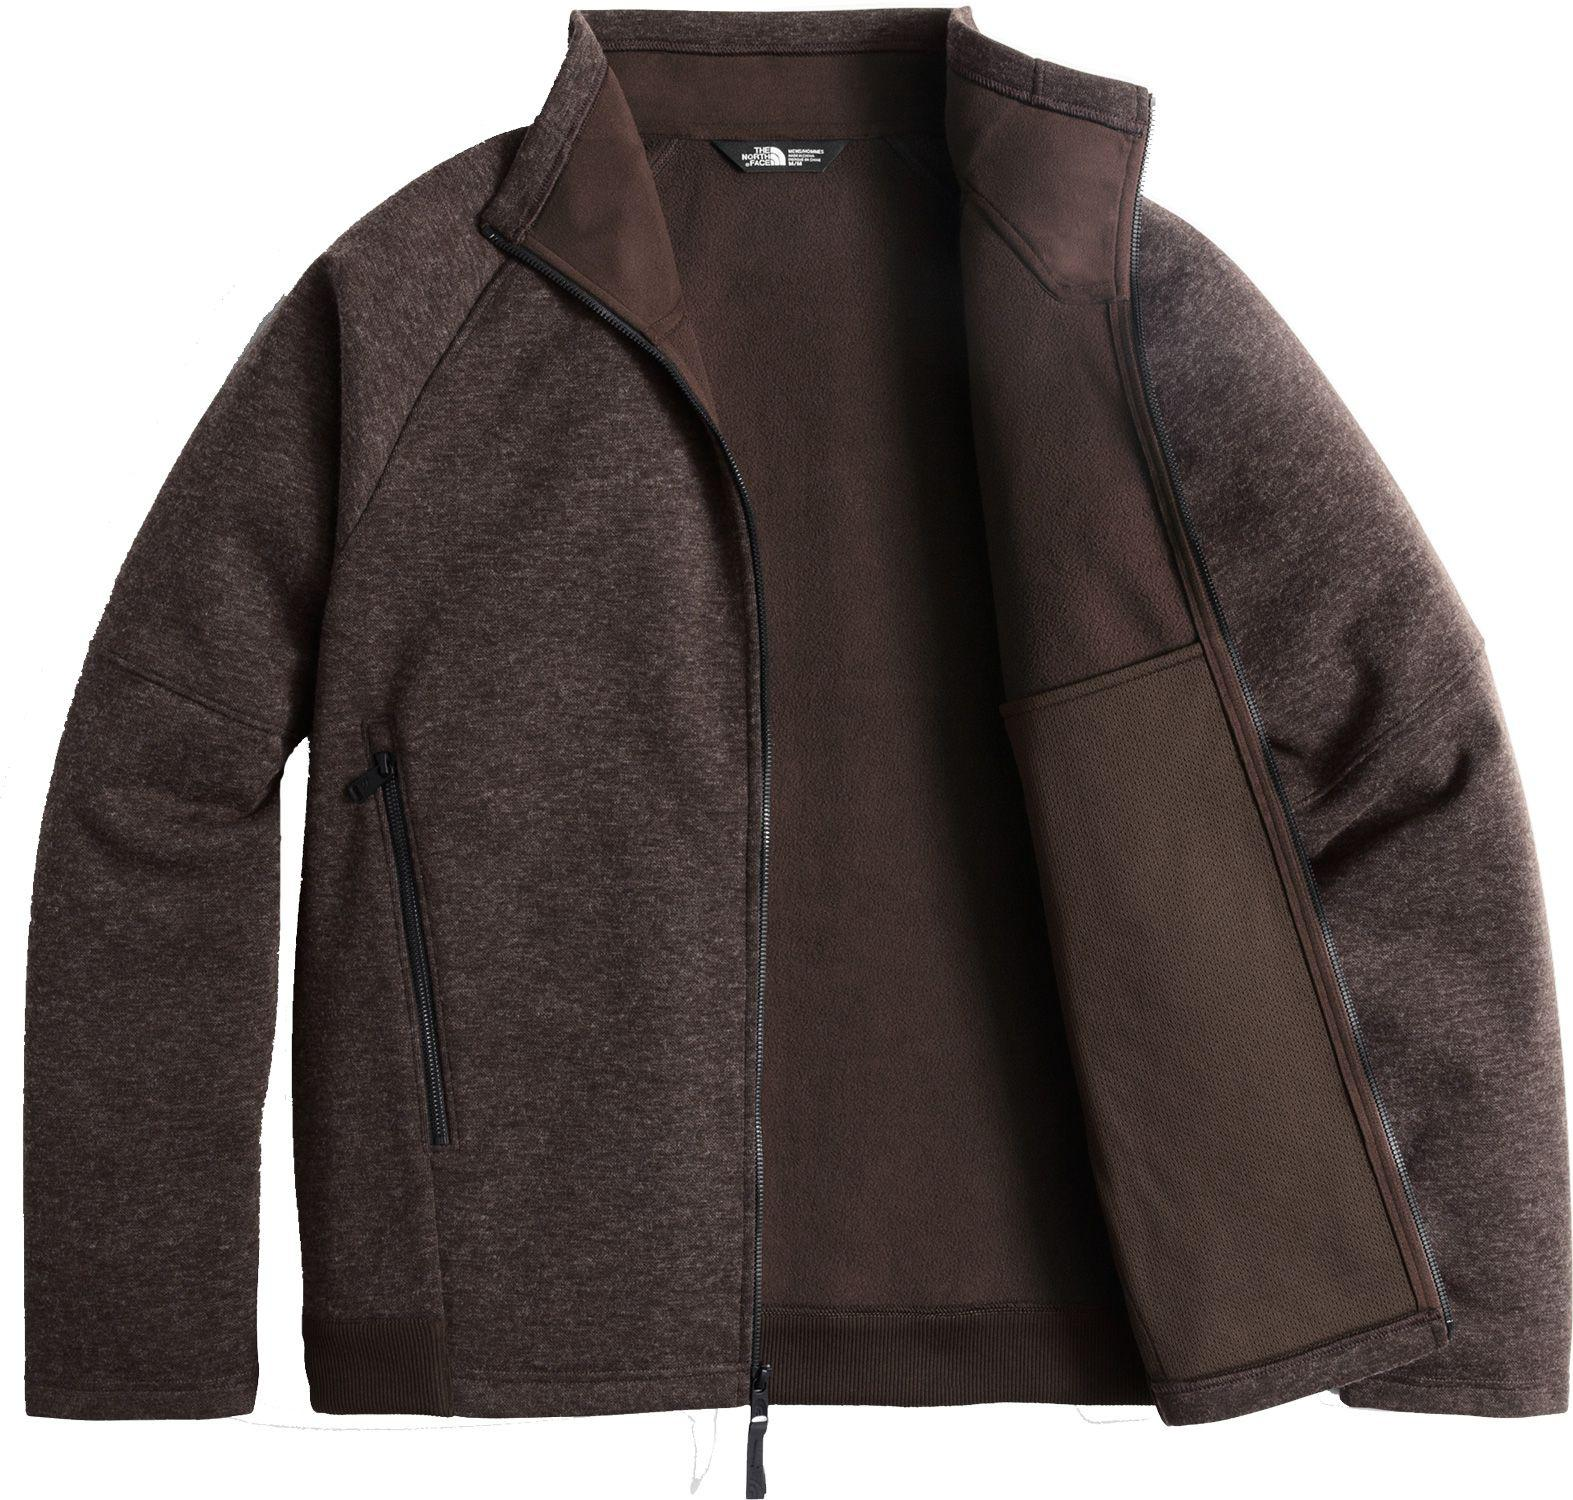 70e95d4da The North Face Brown Far Northern Full Zip Fleece Jacket - Past Season for  men